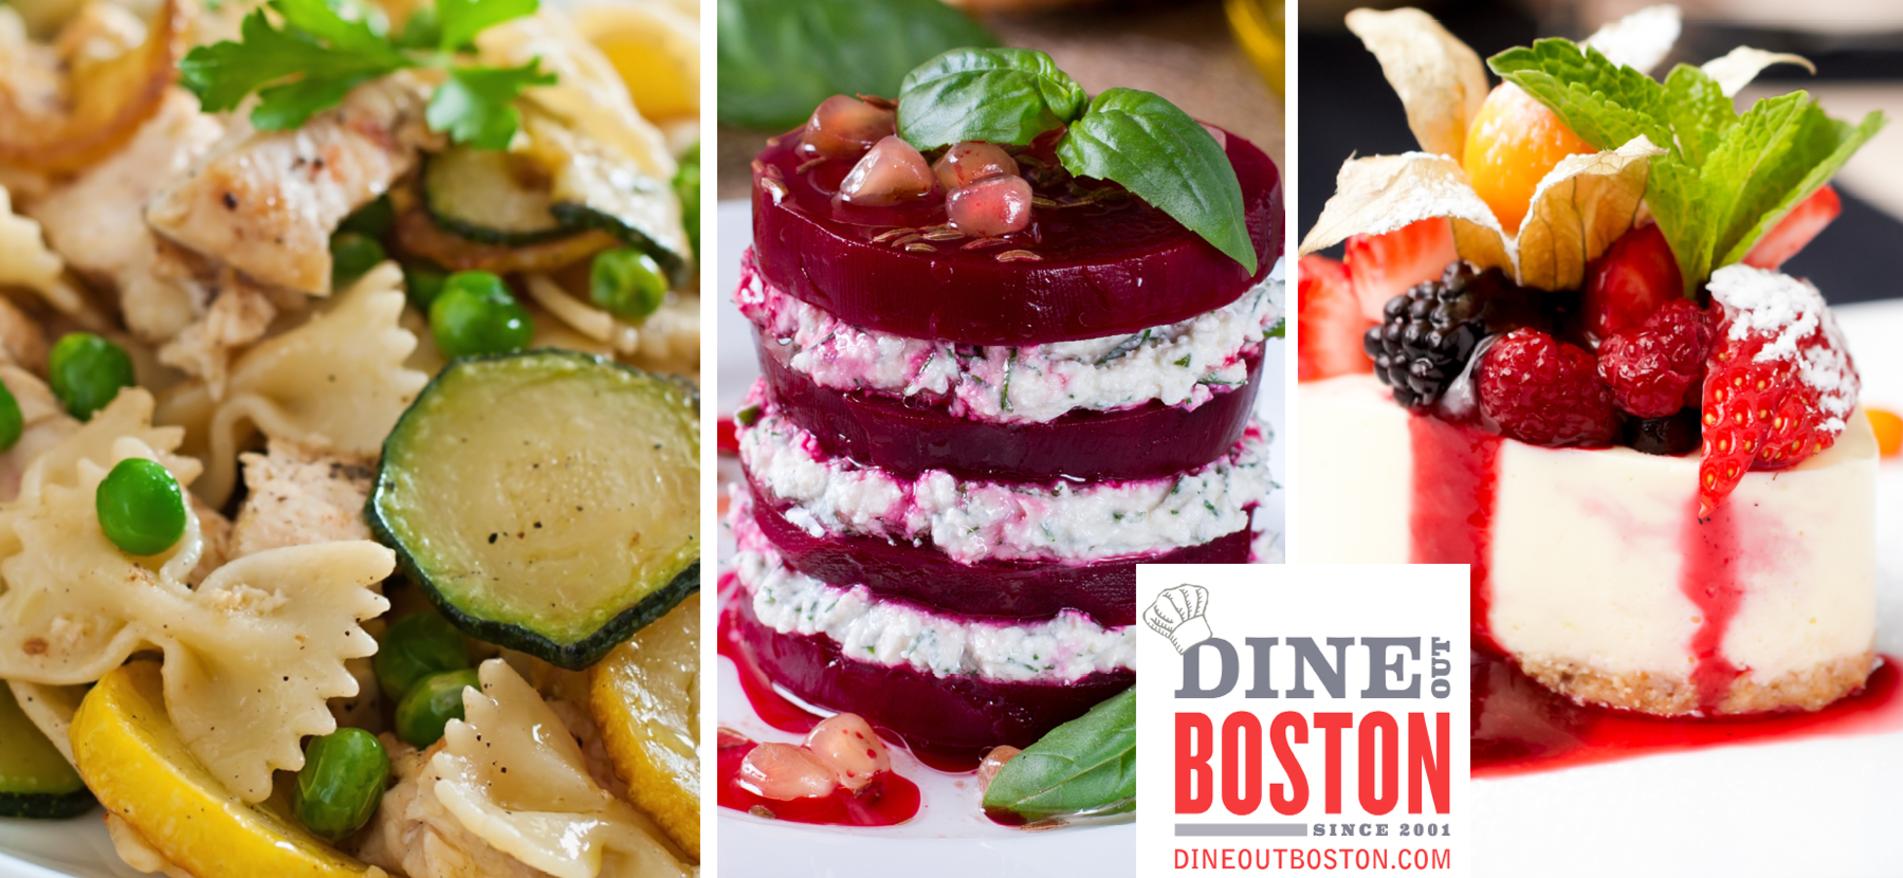 Dine Out Boston Boston Restaurant Week March 3 8 10 15